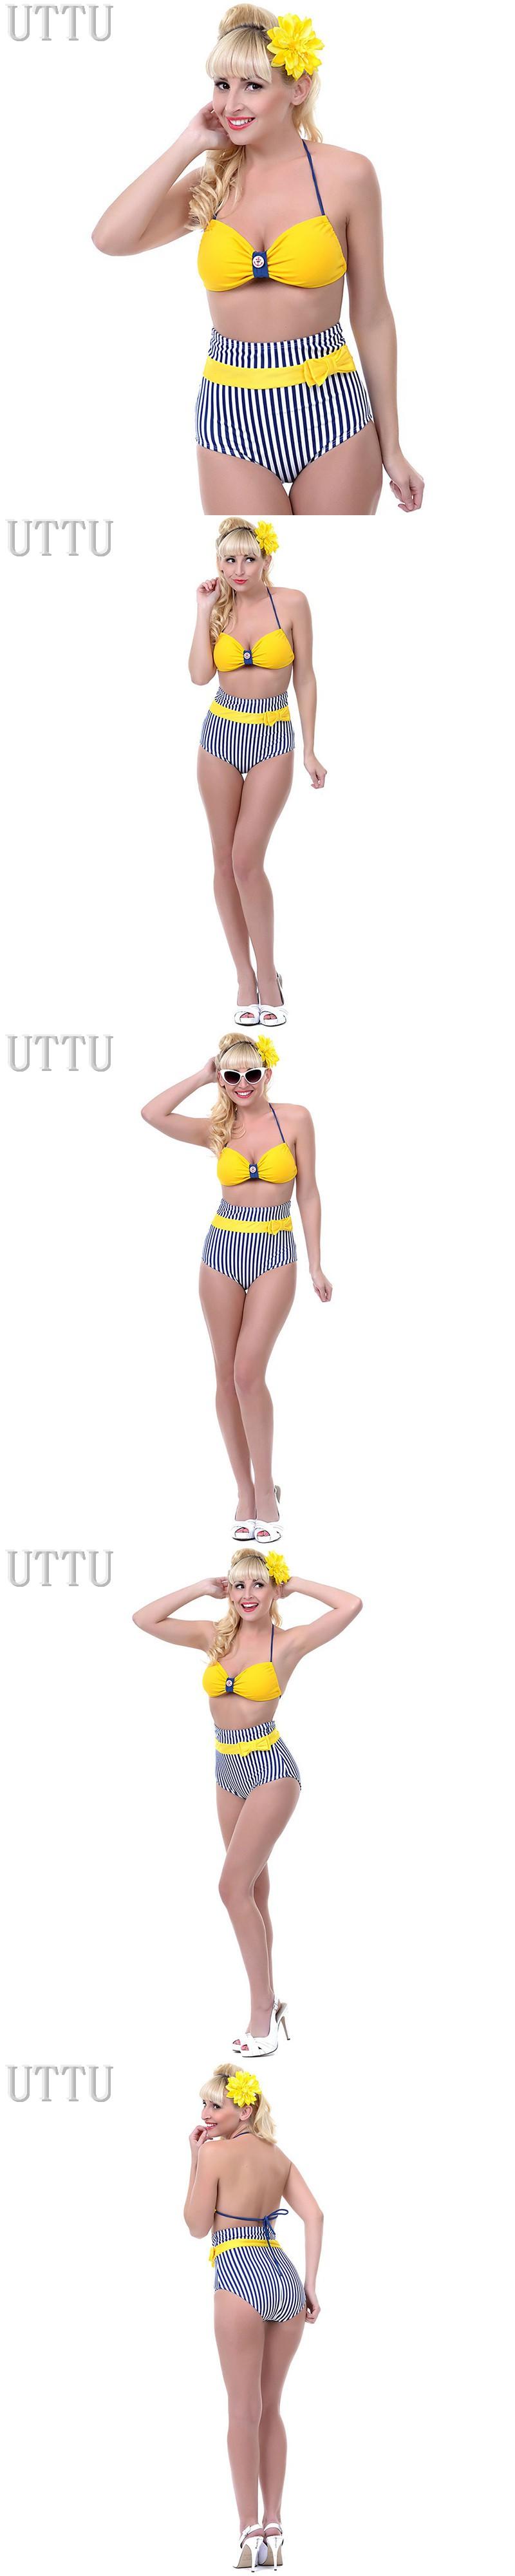 2016 New Arrival Striped Printed High Waist Bikini Set Sexy Halter Bandage Push Up Swimsuit  Swimwear Women Padded Bra Beachwear $12.99